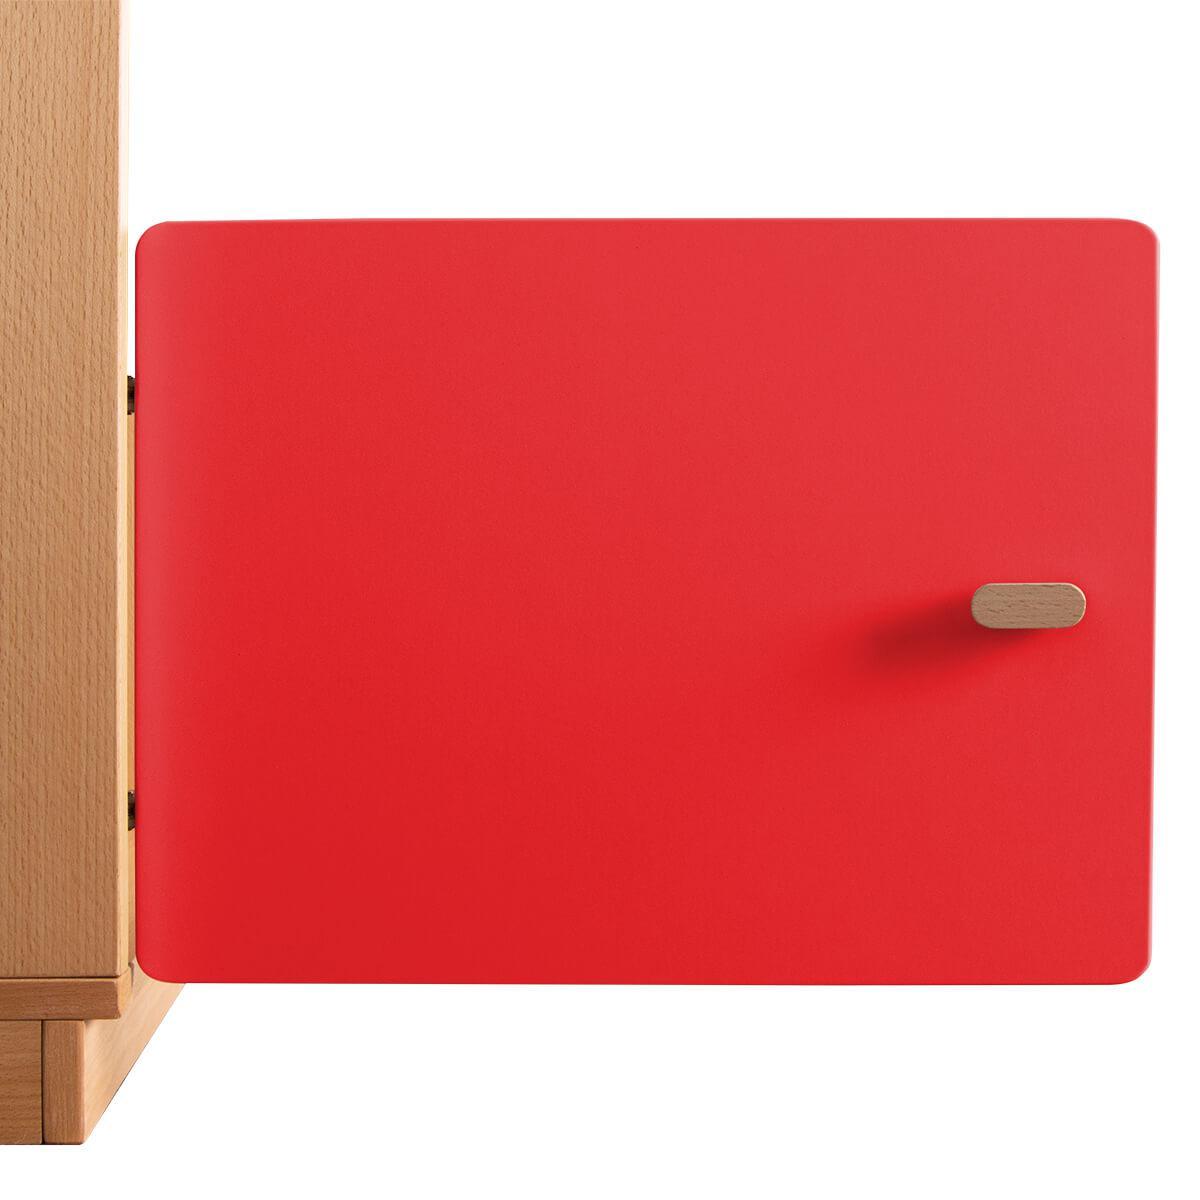 Schranktür 1/5 35cm-Griff DESTYLE de Breuyn MDF rot-lackiert